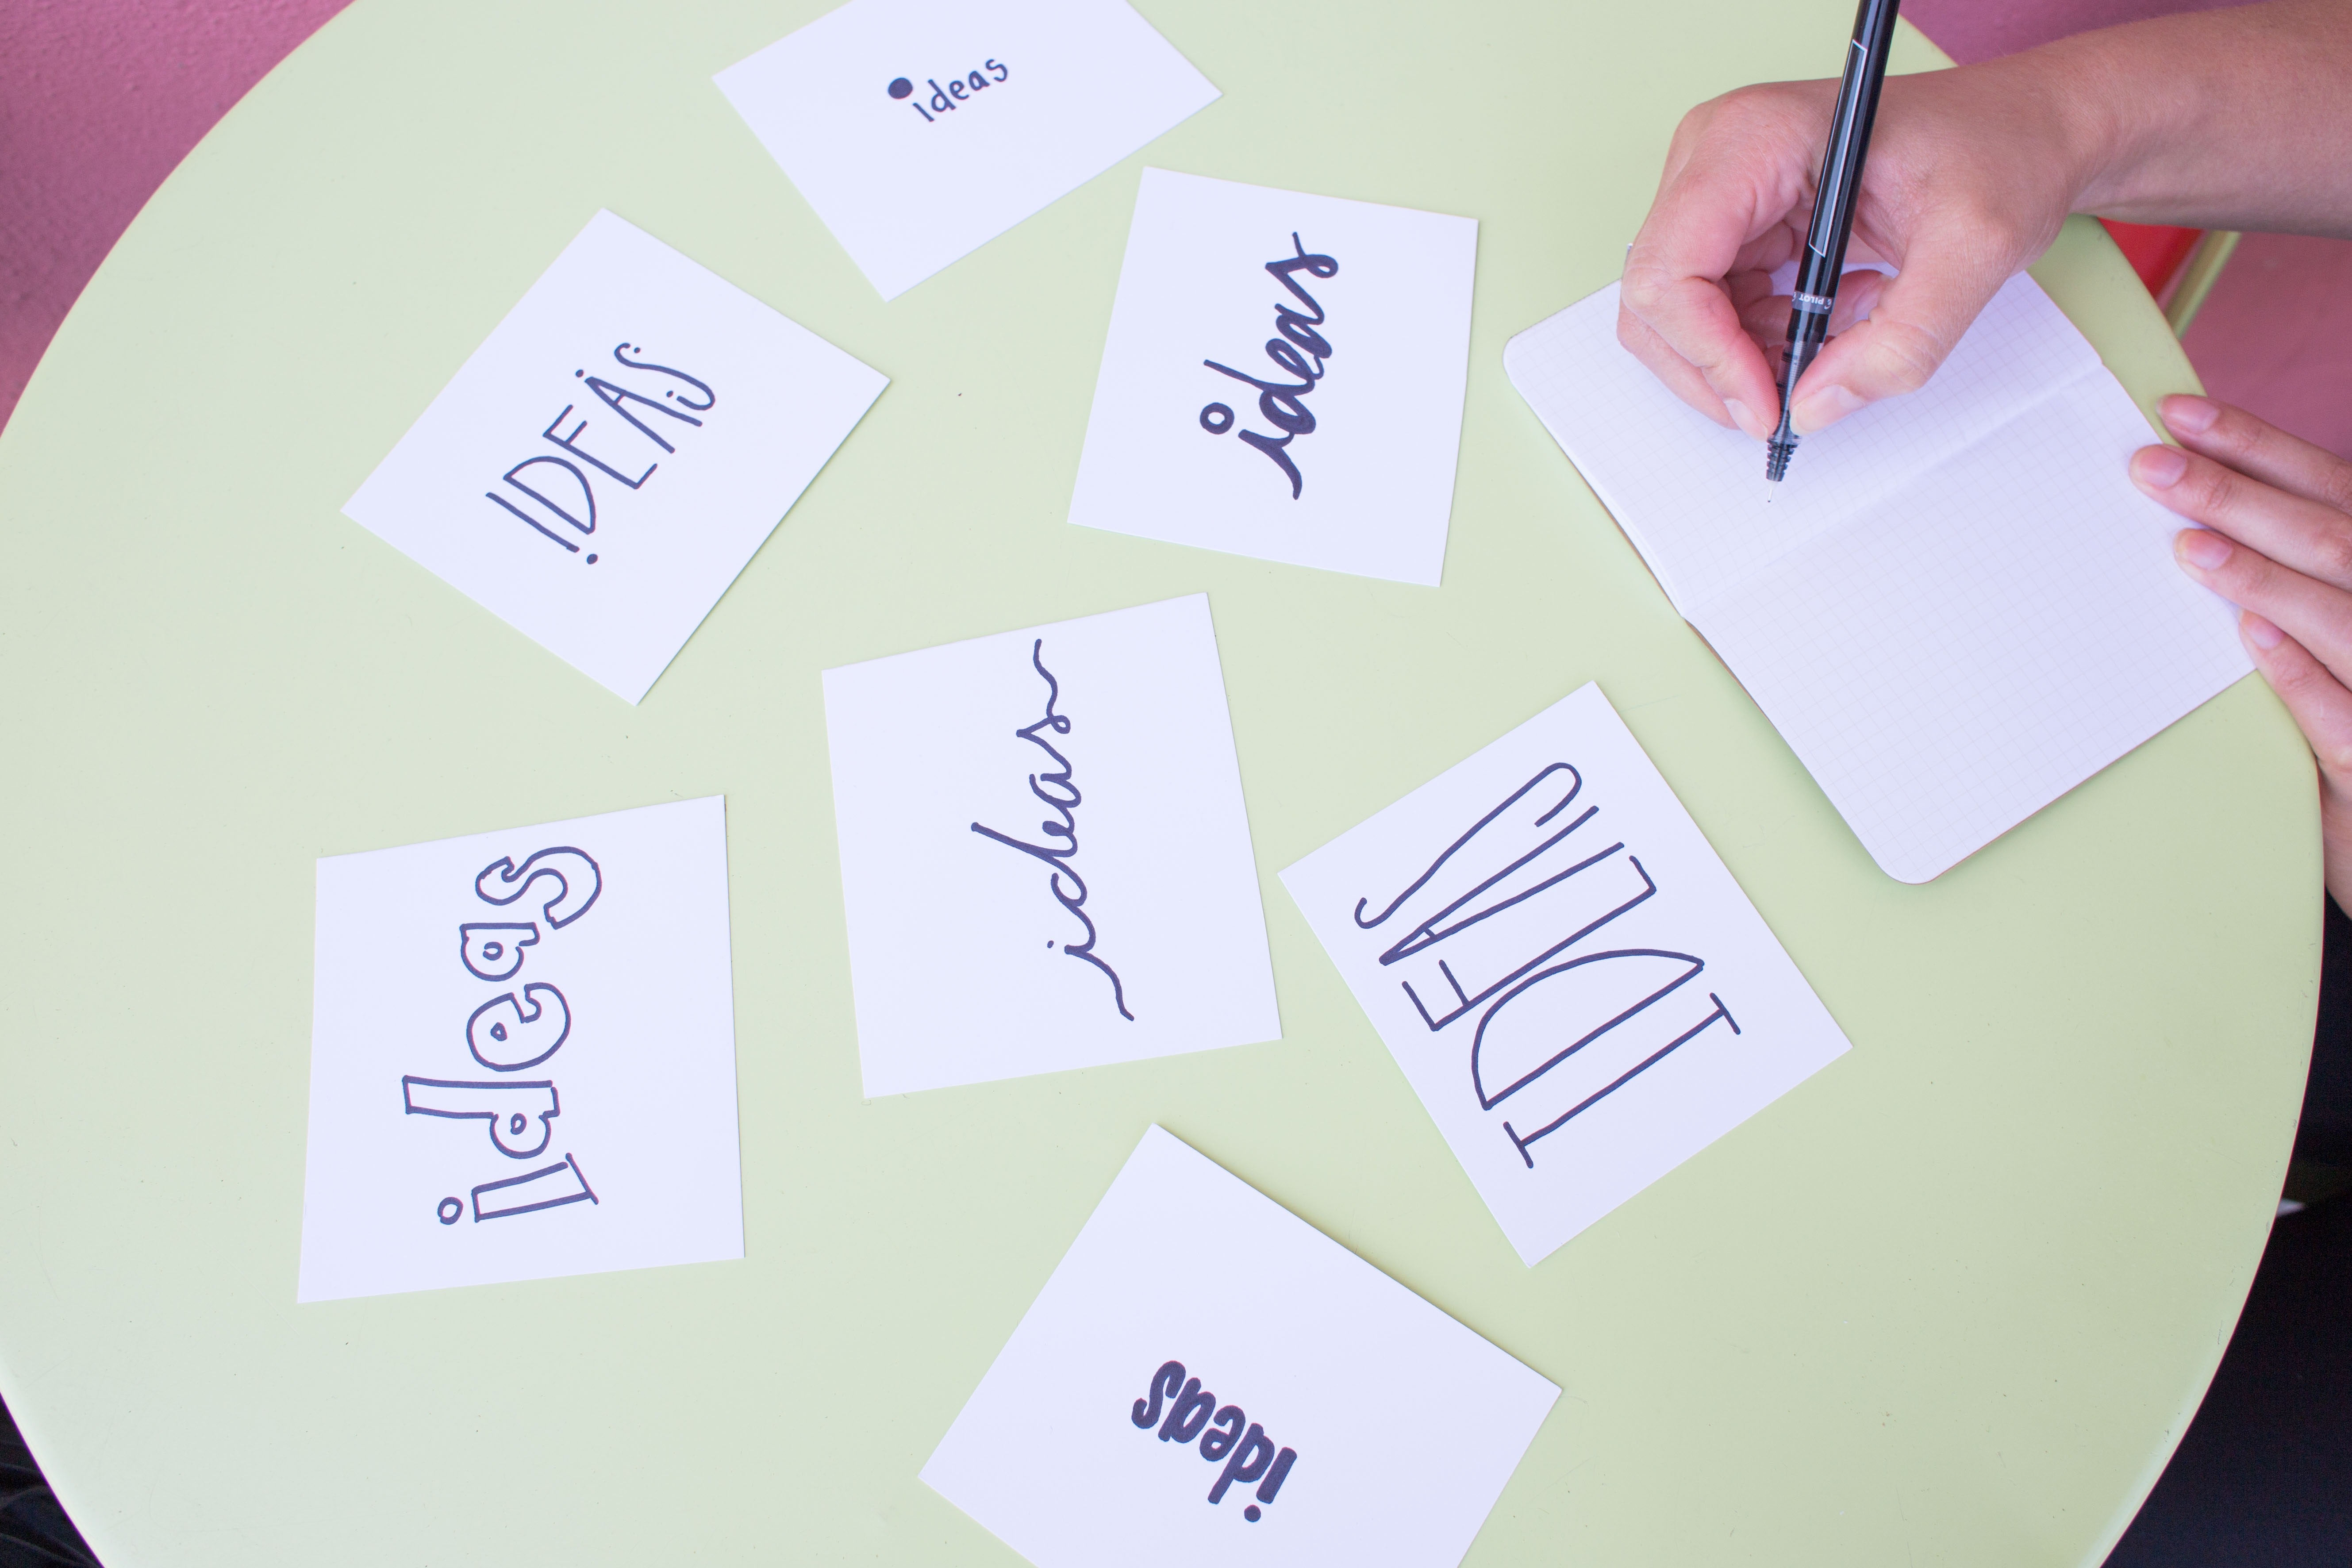 blur-brainstorming-business-269448